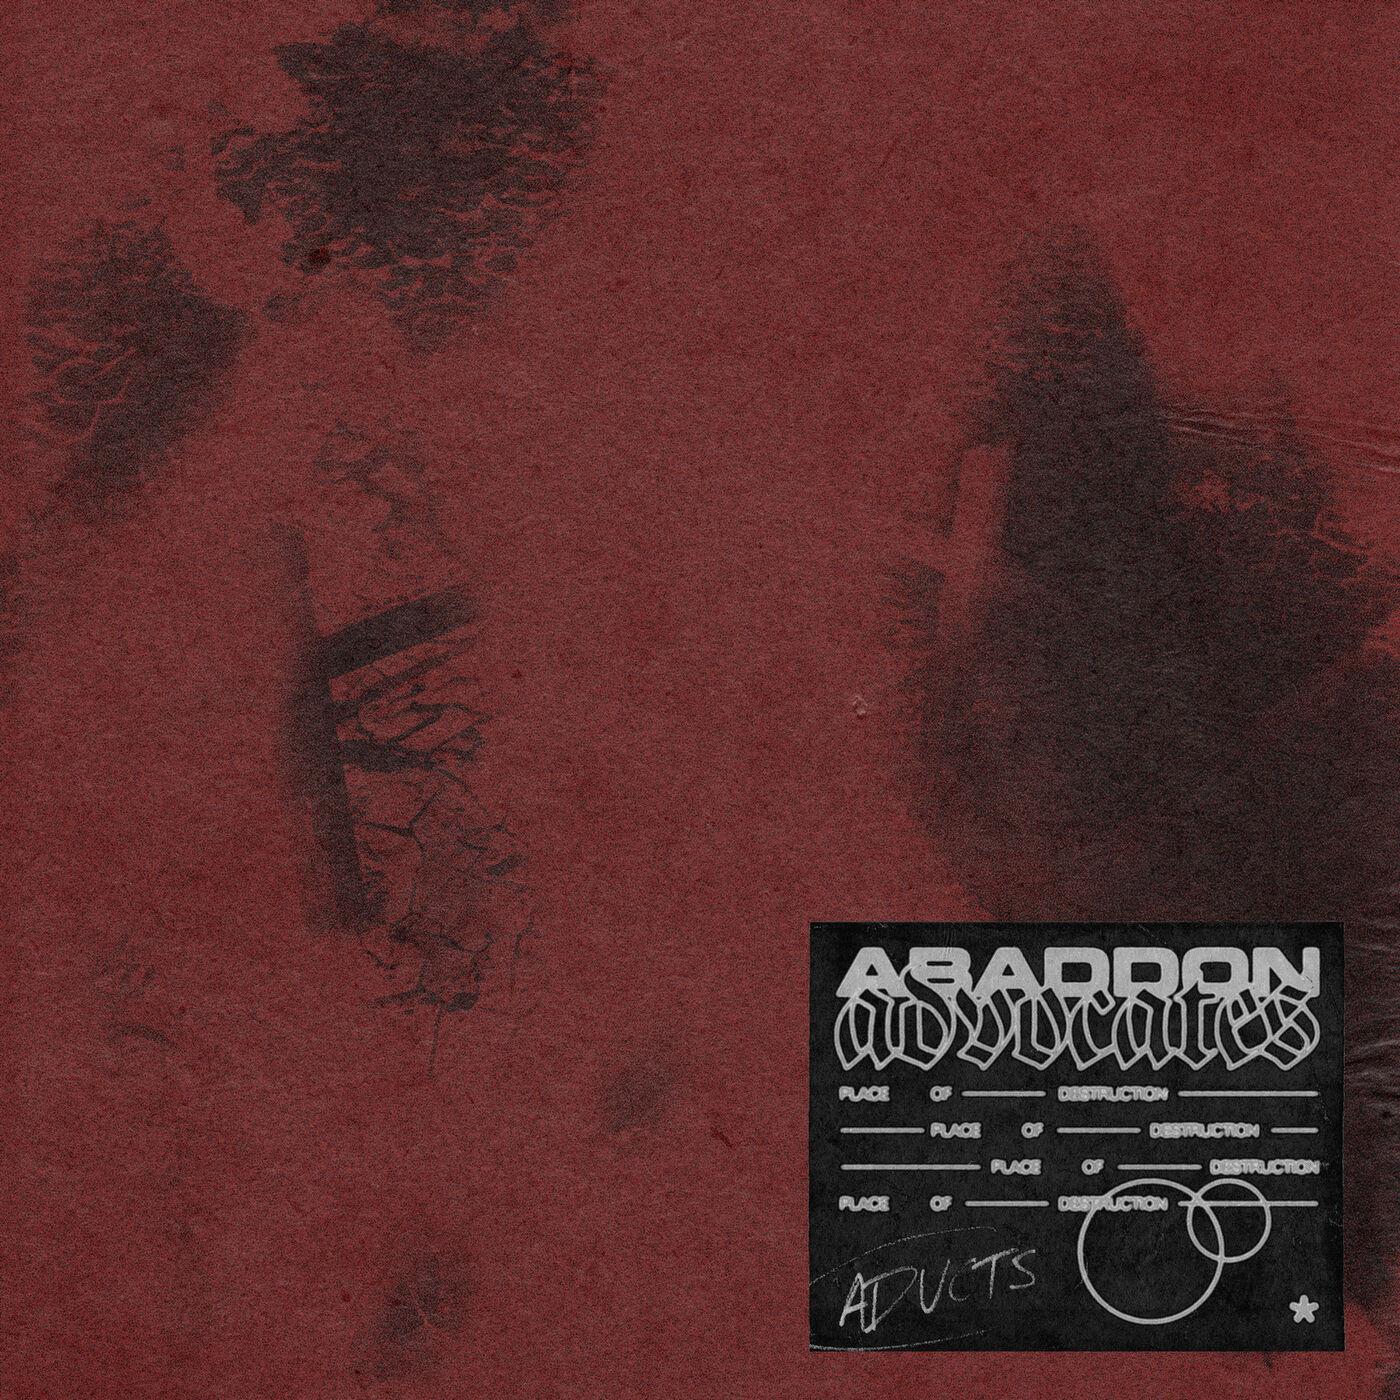 Advocates - Abaddon [single] (2019)